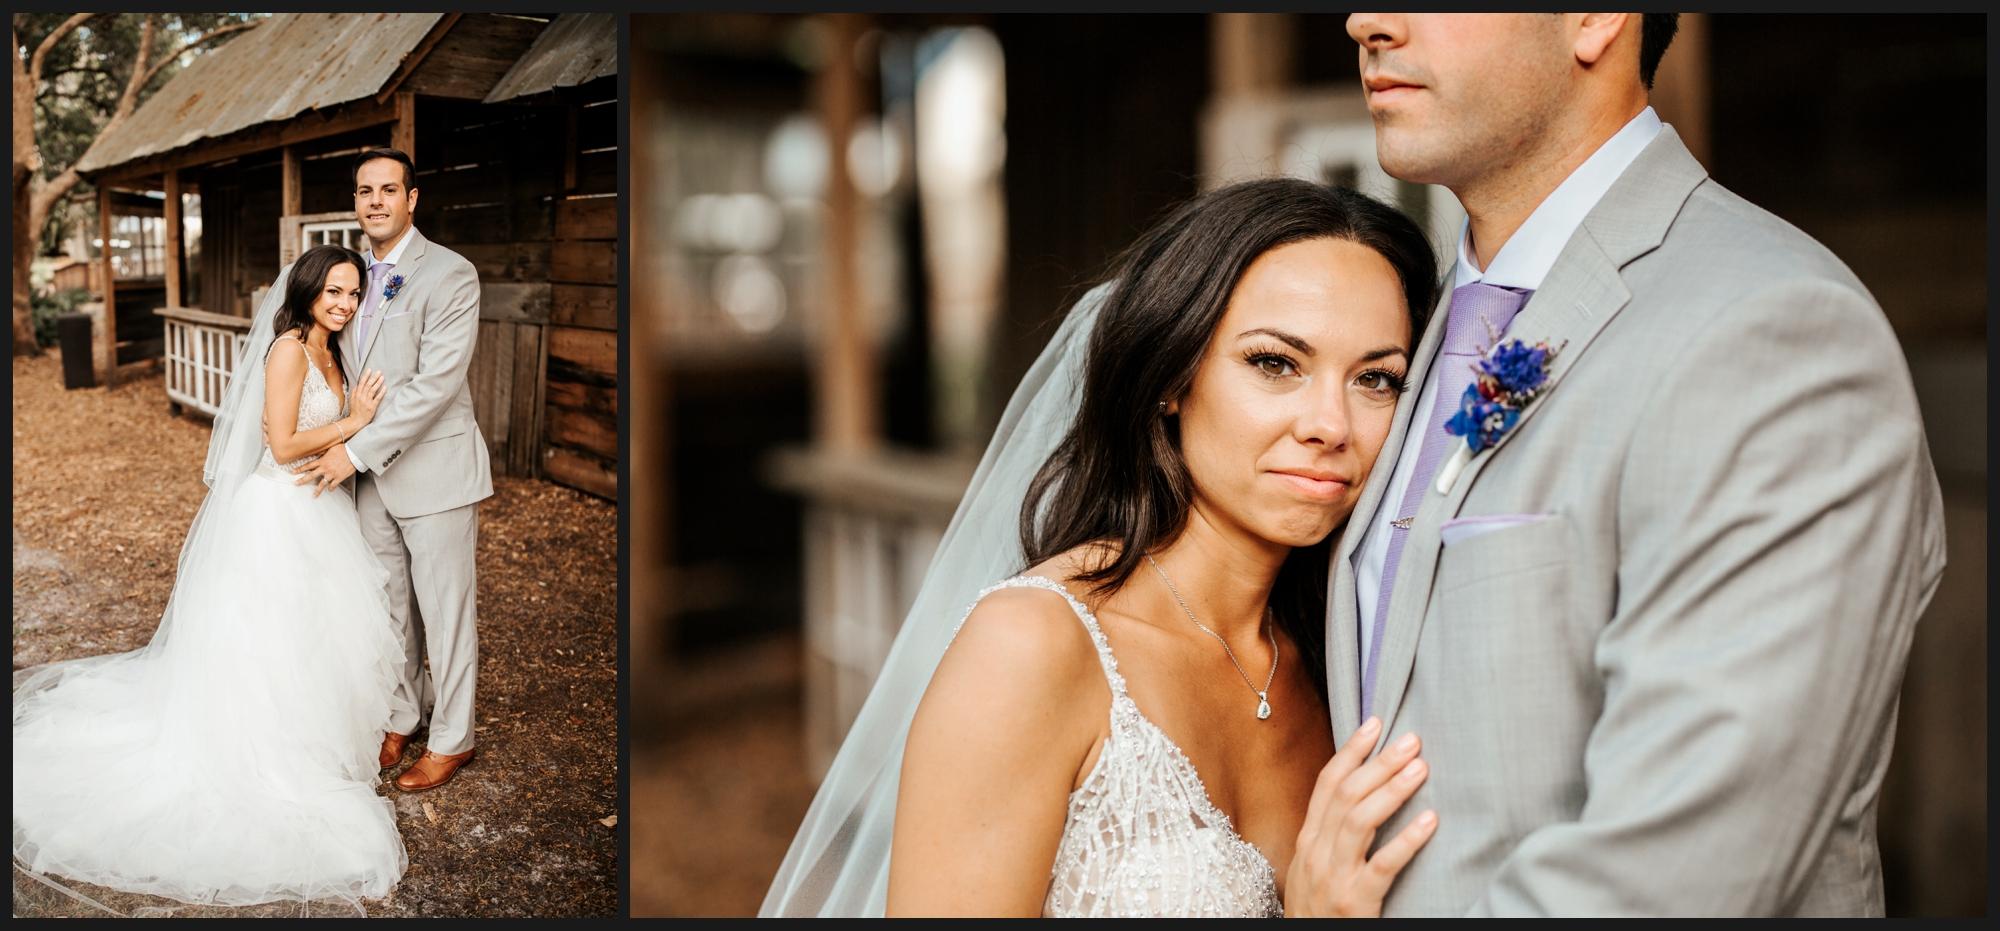 Orlando-Wedding-Photographer-destination-wedding-photographer-florida-wedding-photographer-bohemian-wedding-photographer_1565.jpg